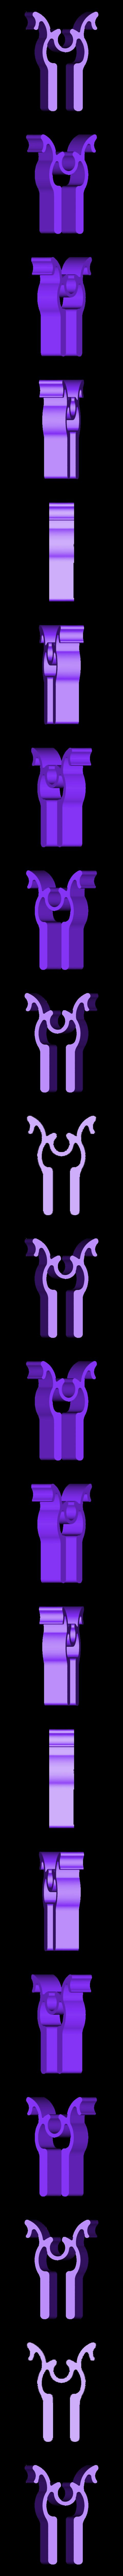 nose_plug_50_smaller_long.stl Download free STL file Nose Clip • Design to 3D print, MuSSy